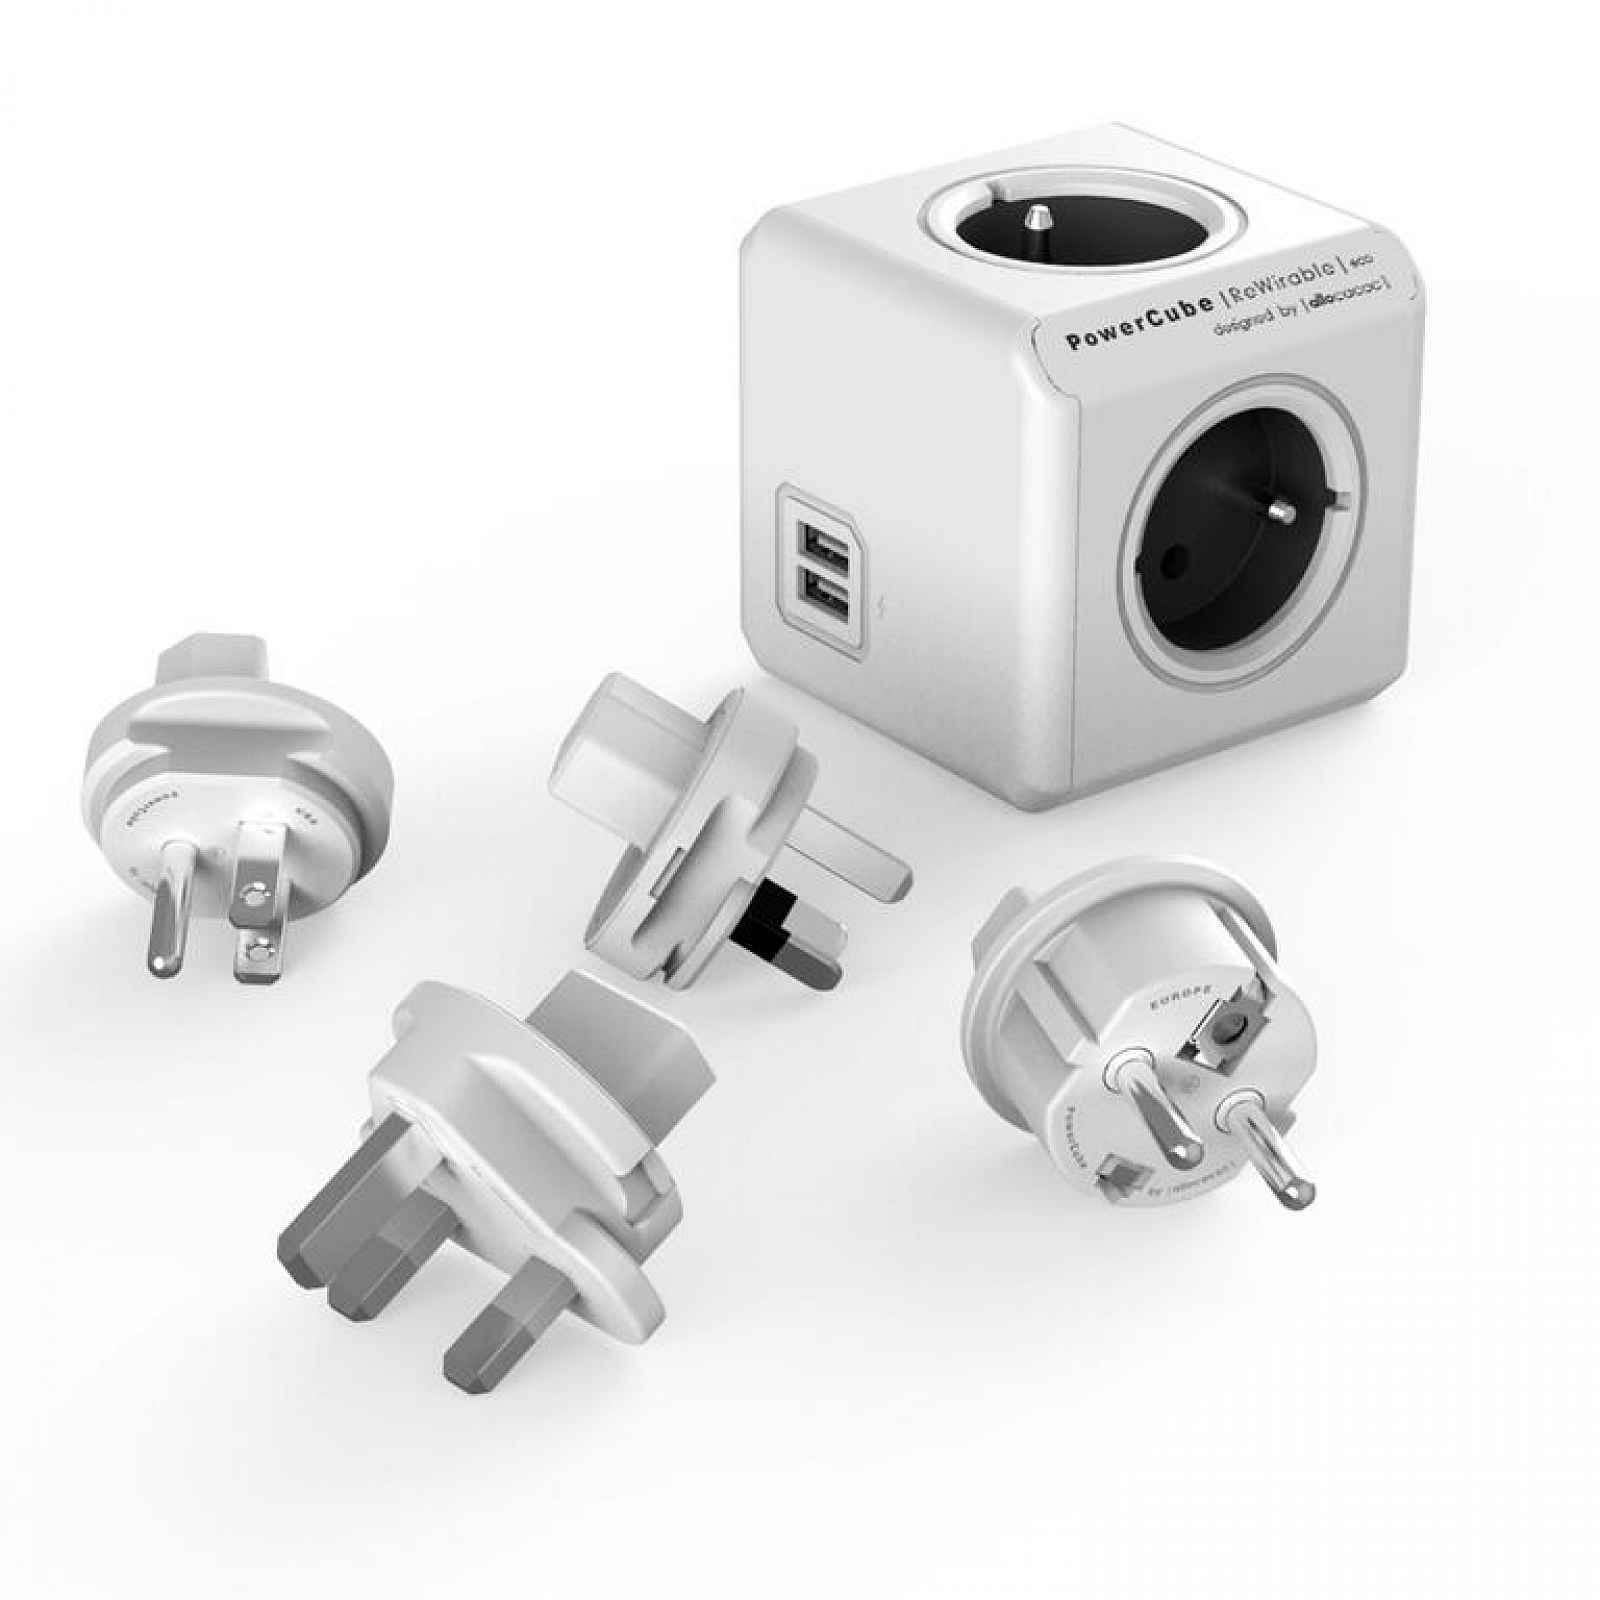 Rozbočovač PowerCube Rewirable USB šedý + cestovní adaptéry